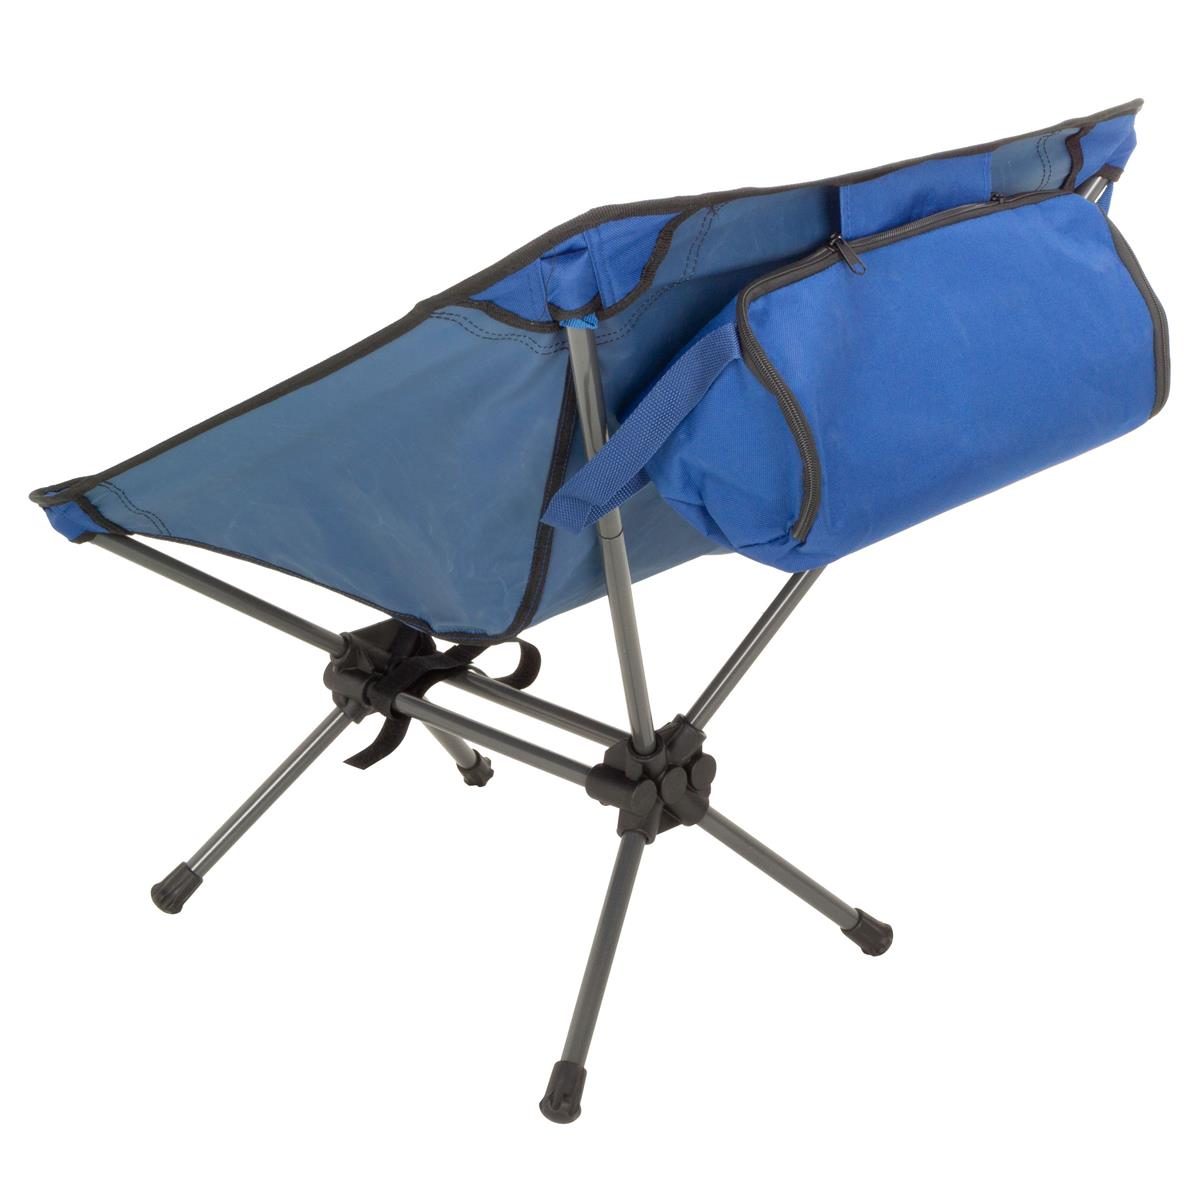 DIVERO Campingsessel Campingstuhl Moonchair Angelsitz blau Polyester Stahl